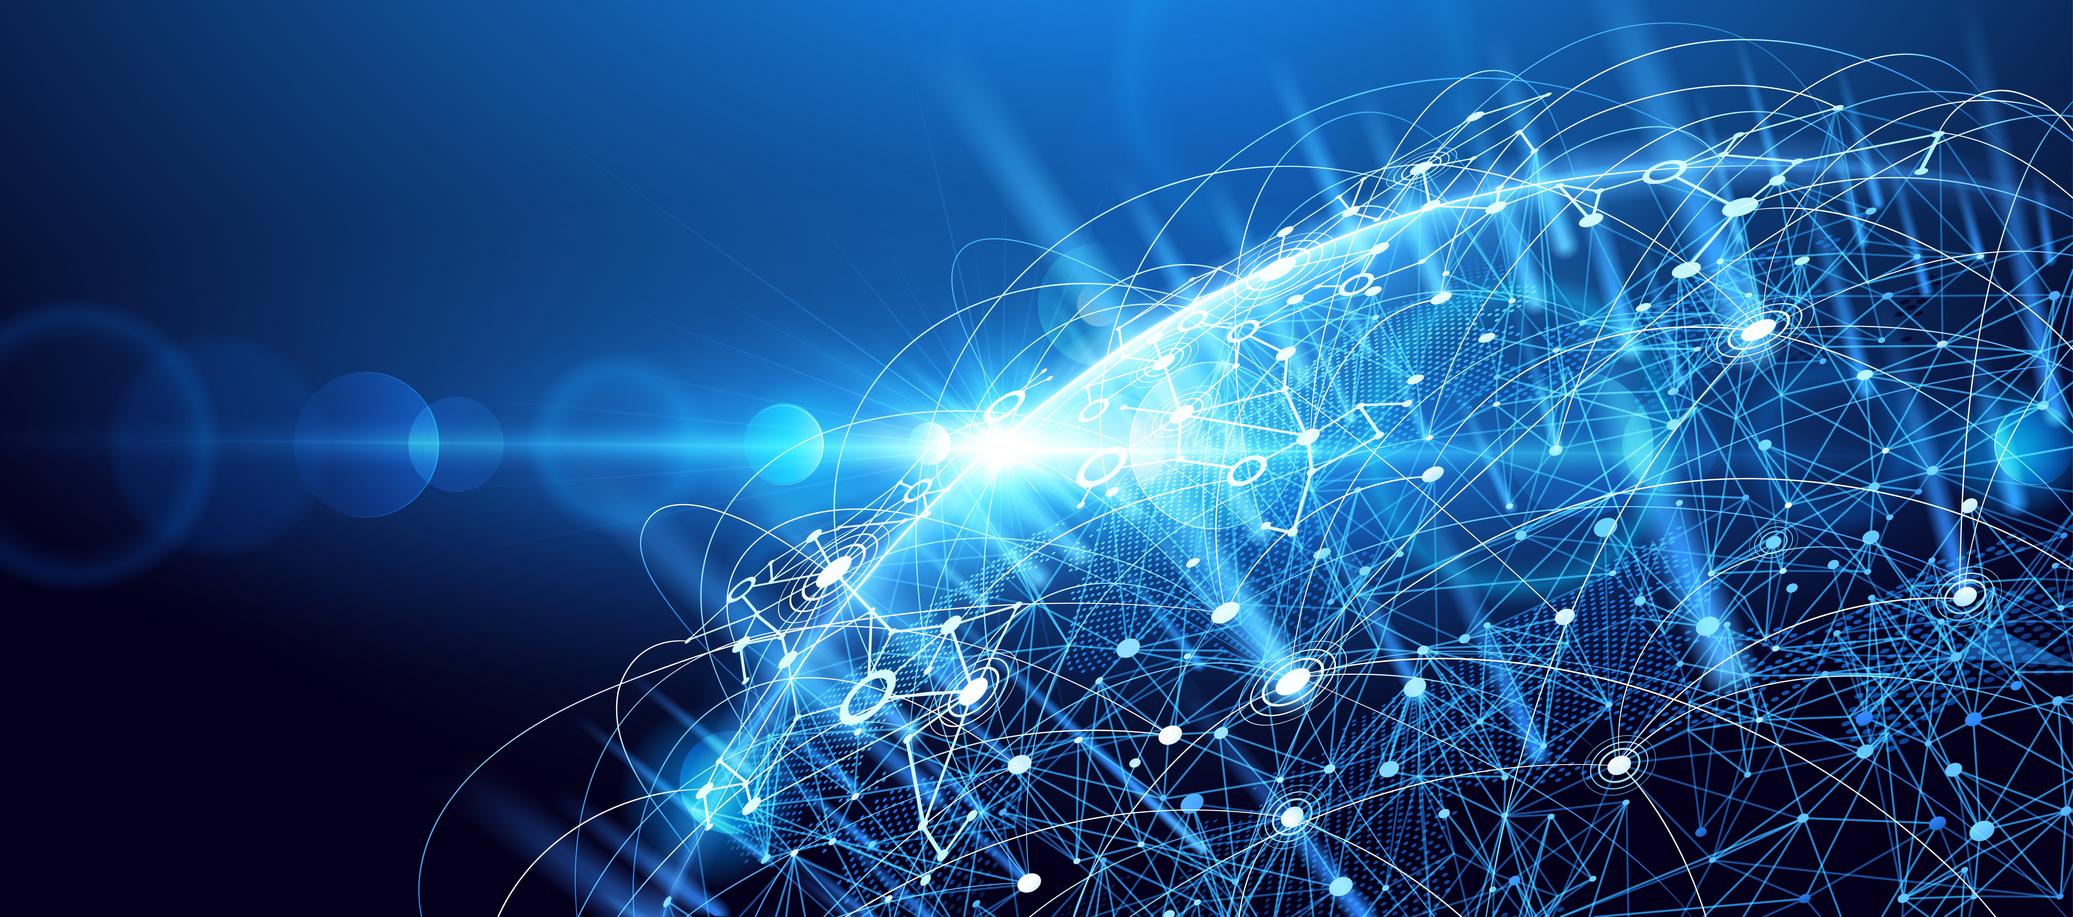 web-traffic-floating-around-the-globe.jpg